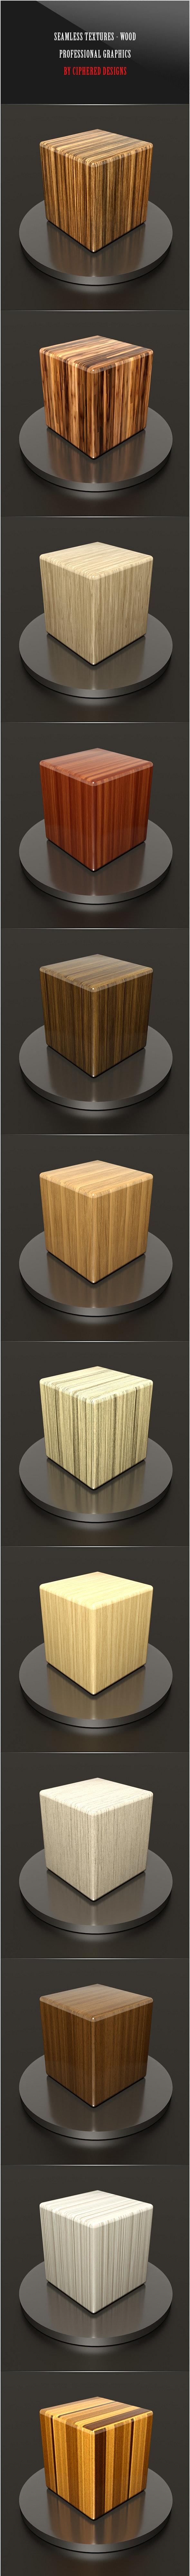 Seamless Textures - Wood - Textures / Fills / Patterns Photoshop